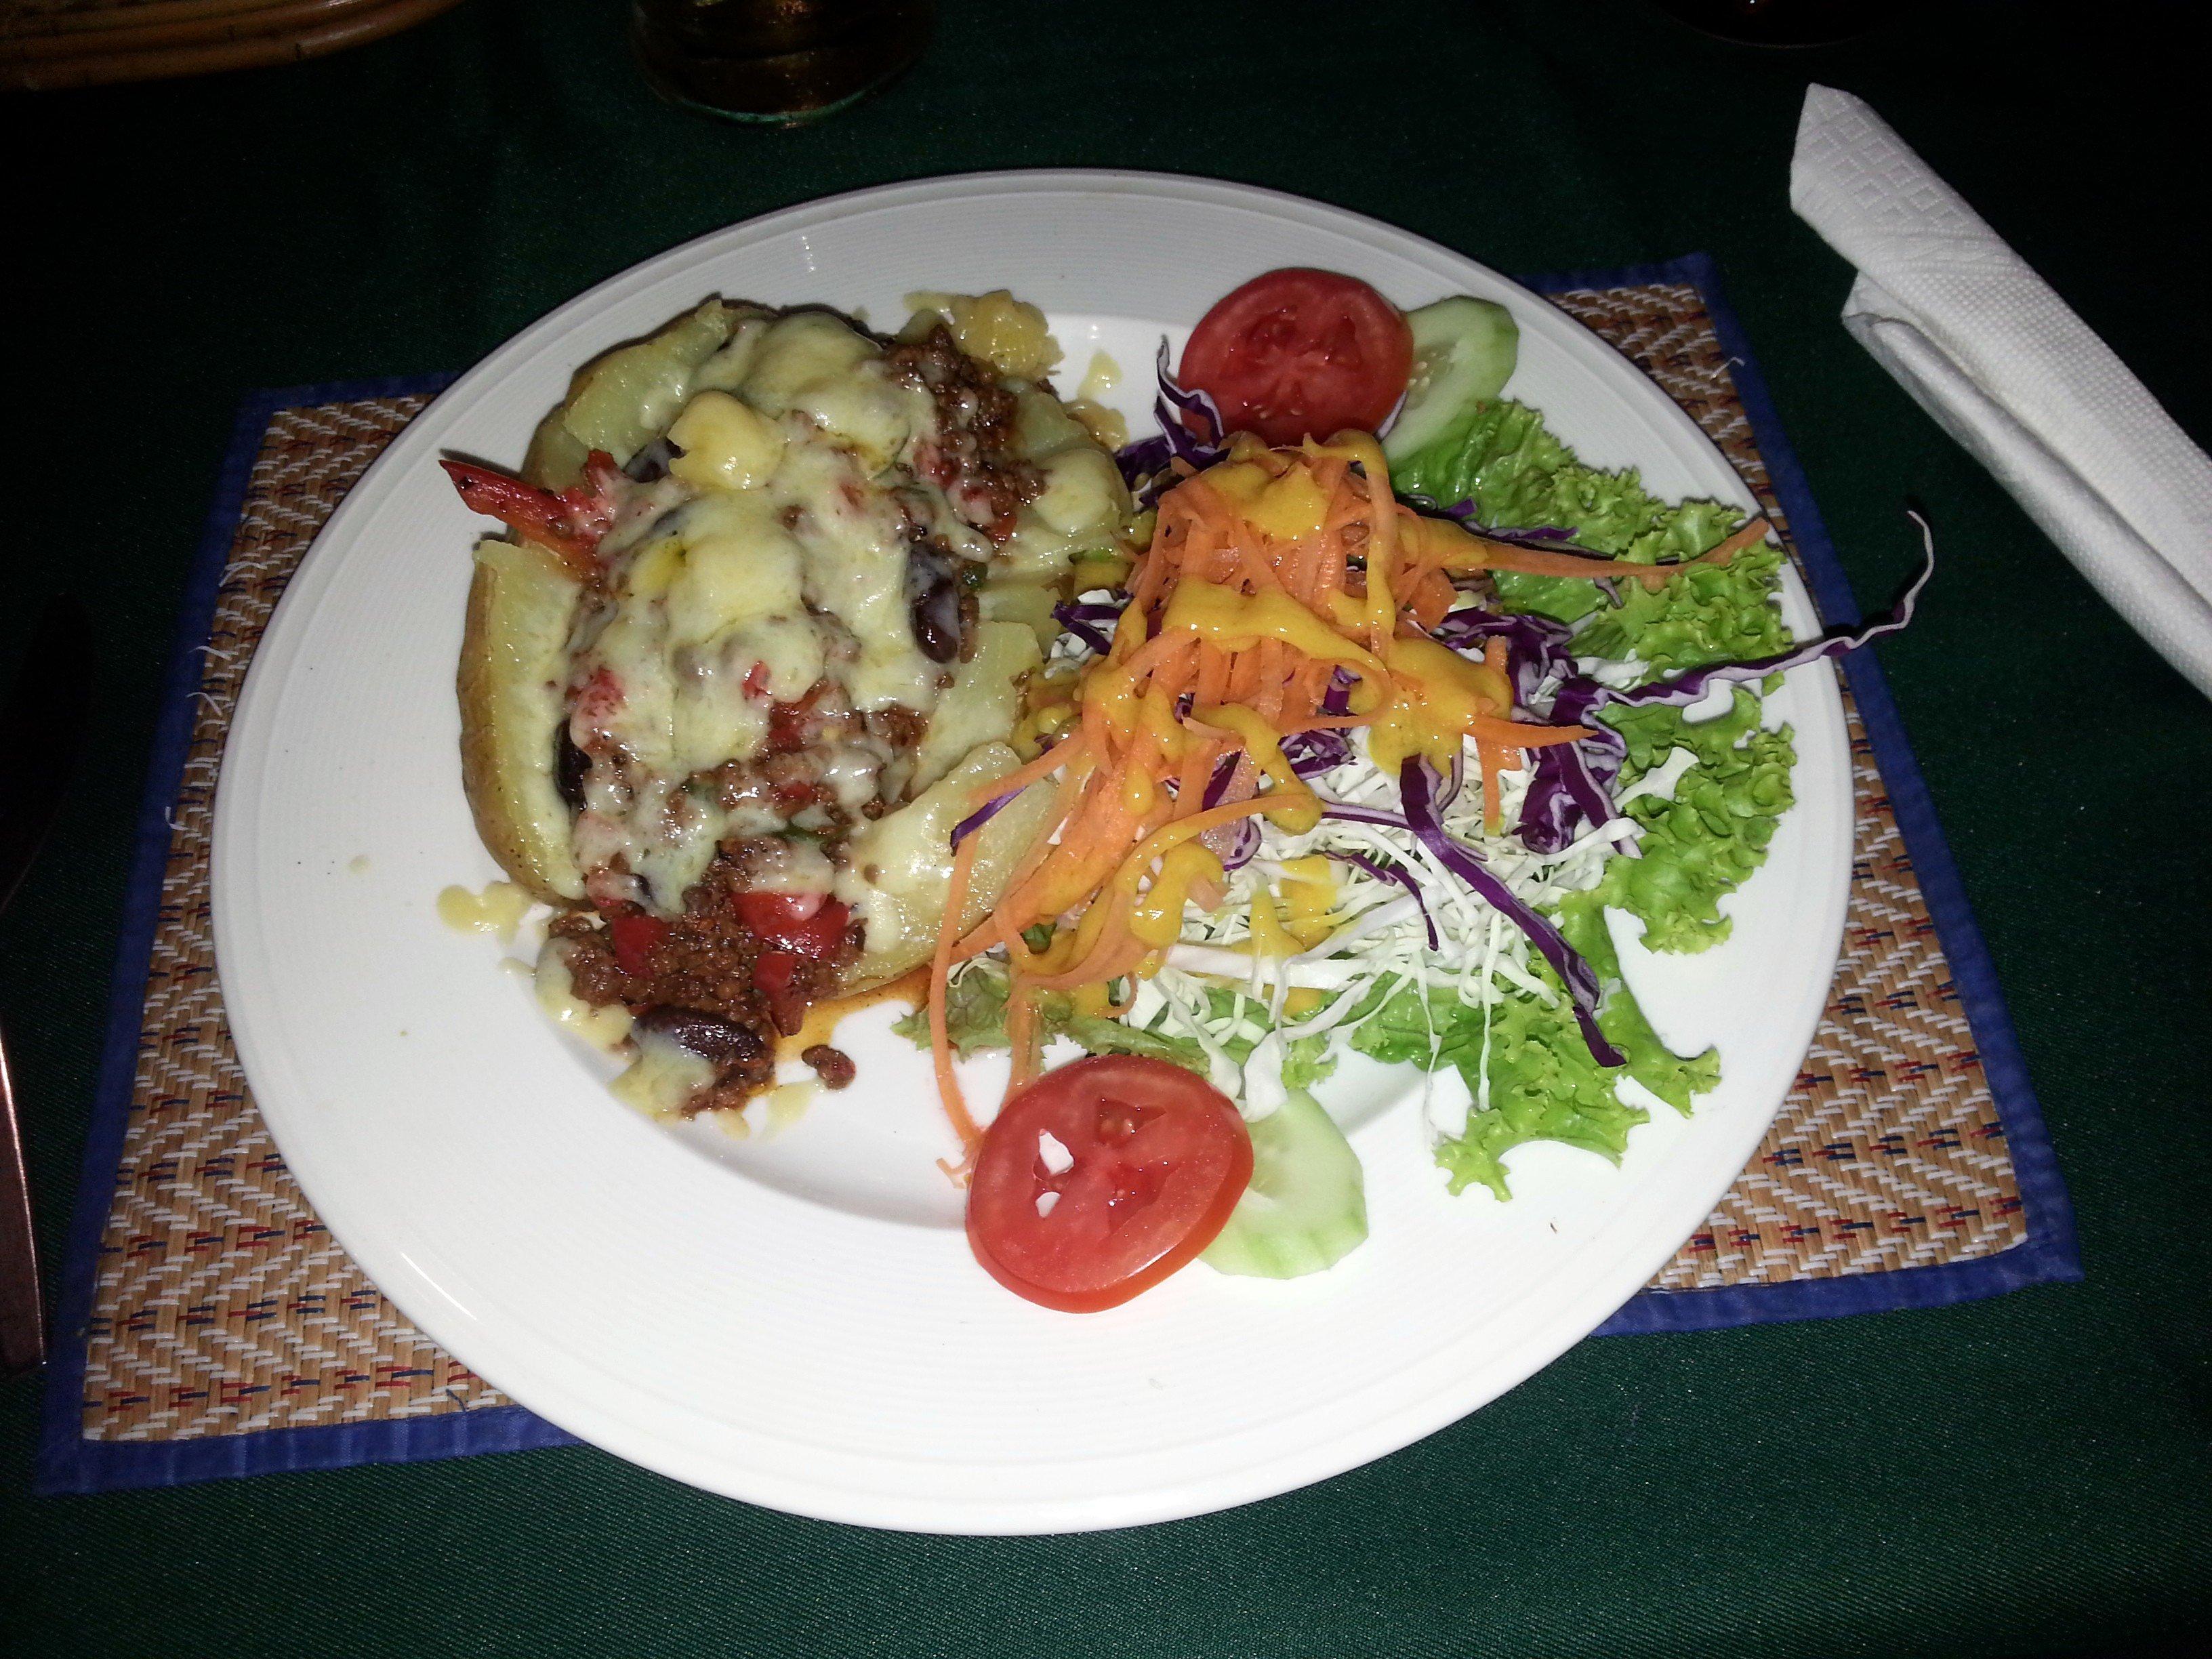 Jacket potato with chilli at the Irish Clock